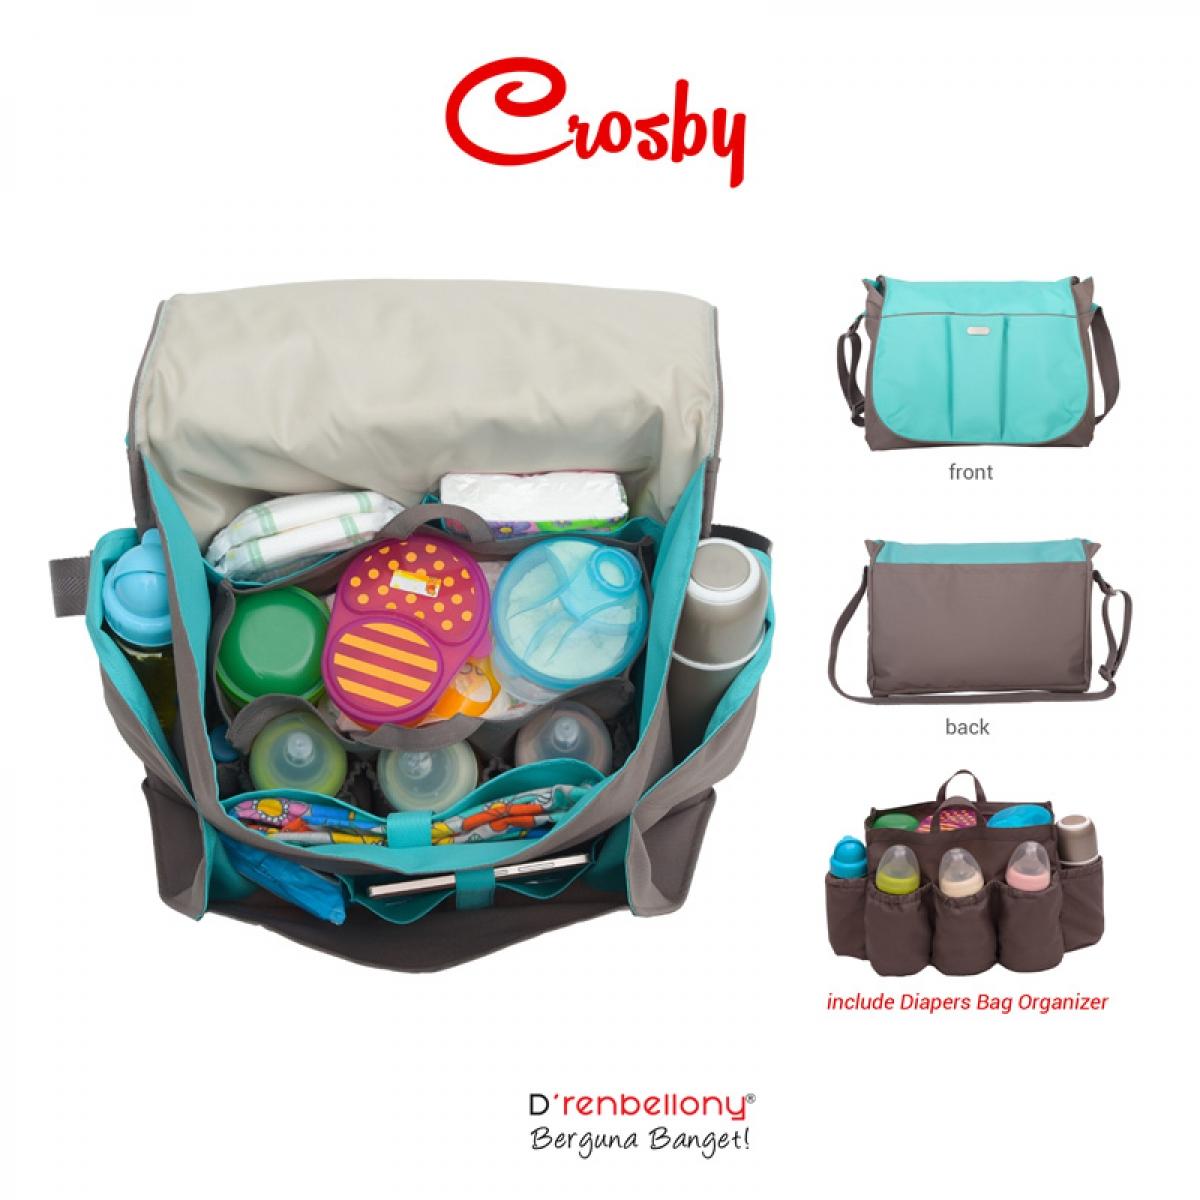 Tas Archives Page 4 Of 150 Dksh Fashionable Selempang Wanita Dkin 315 Crosby Baby Bag Drenbellony Perlengkapan Travel Mandi Bayi Balita Anak Diaper